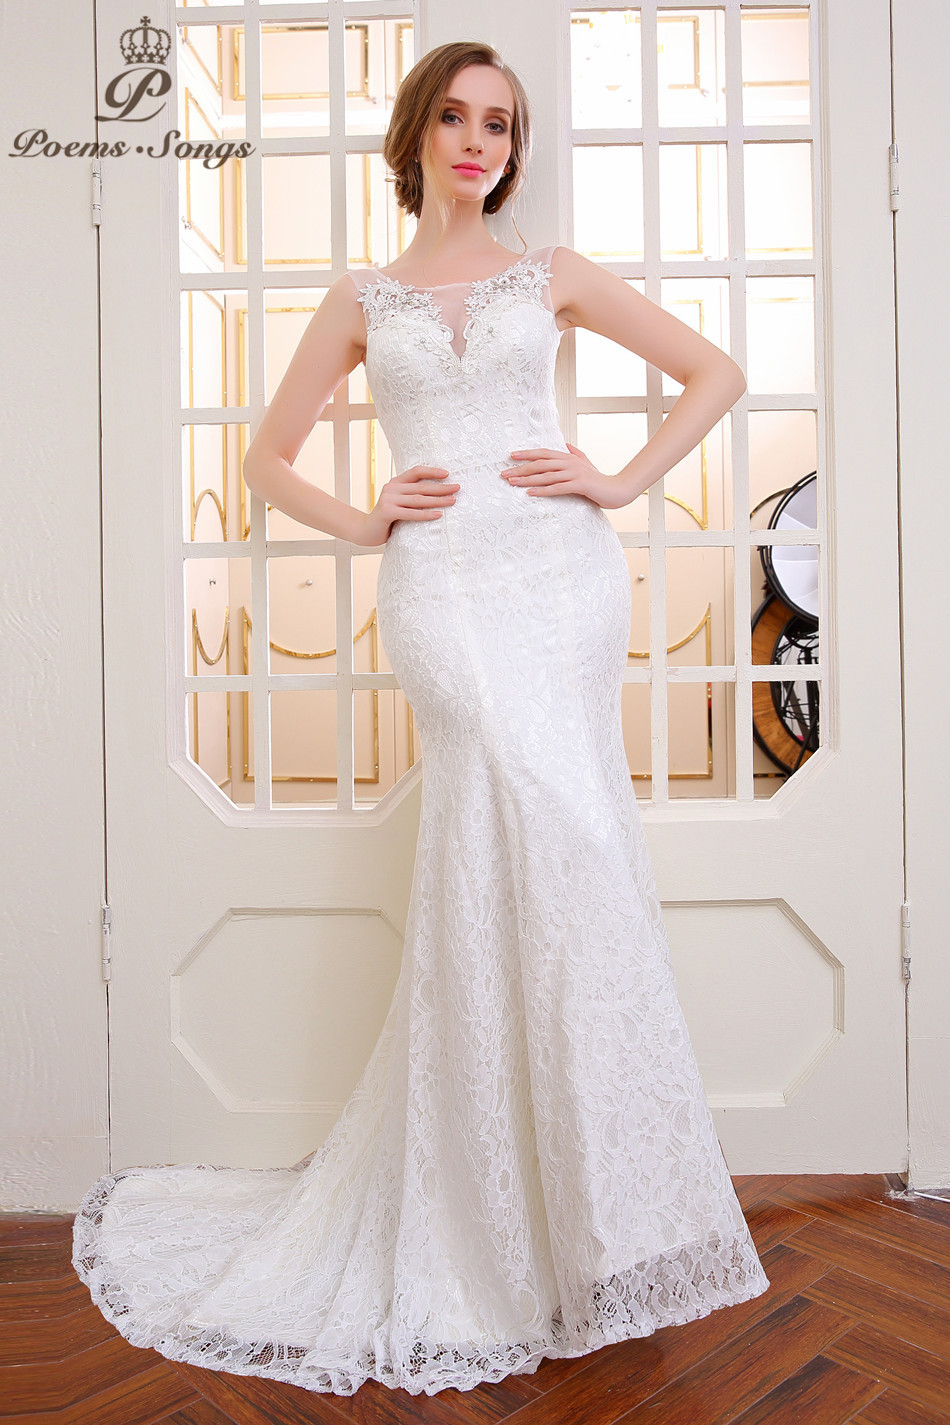 Poemssongs lace flower mermaid wedding dress vestido de noiva sereia com renda arabische abendkleider ball gown